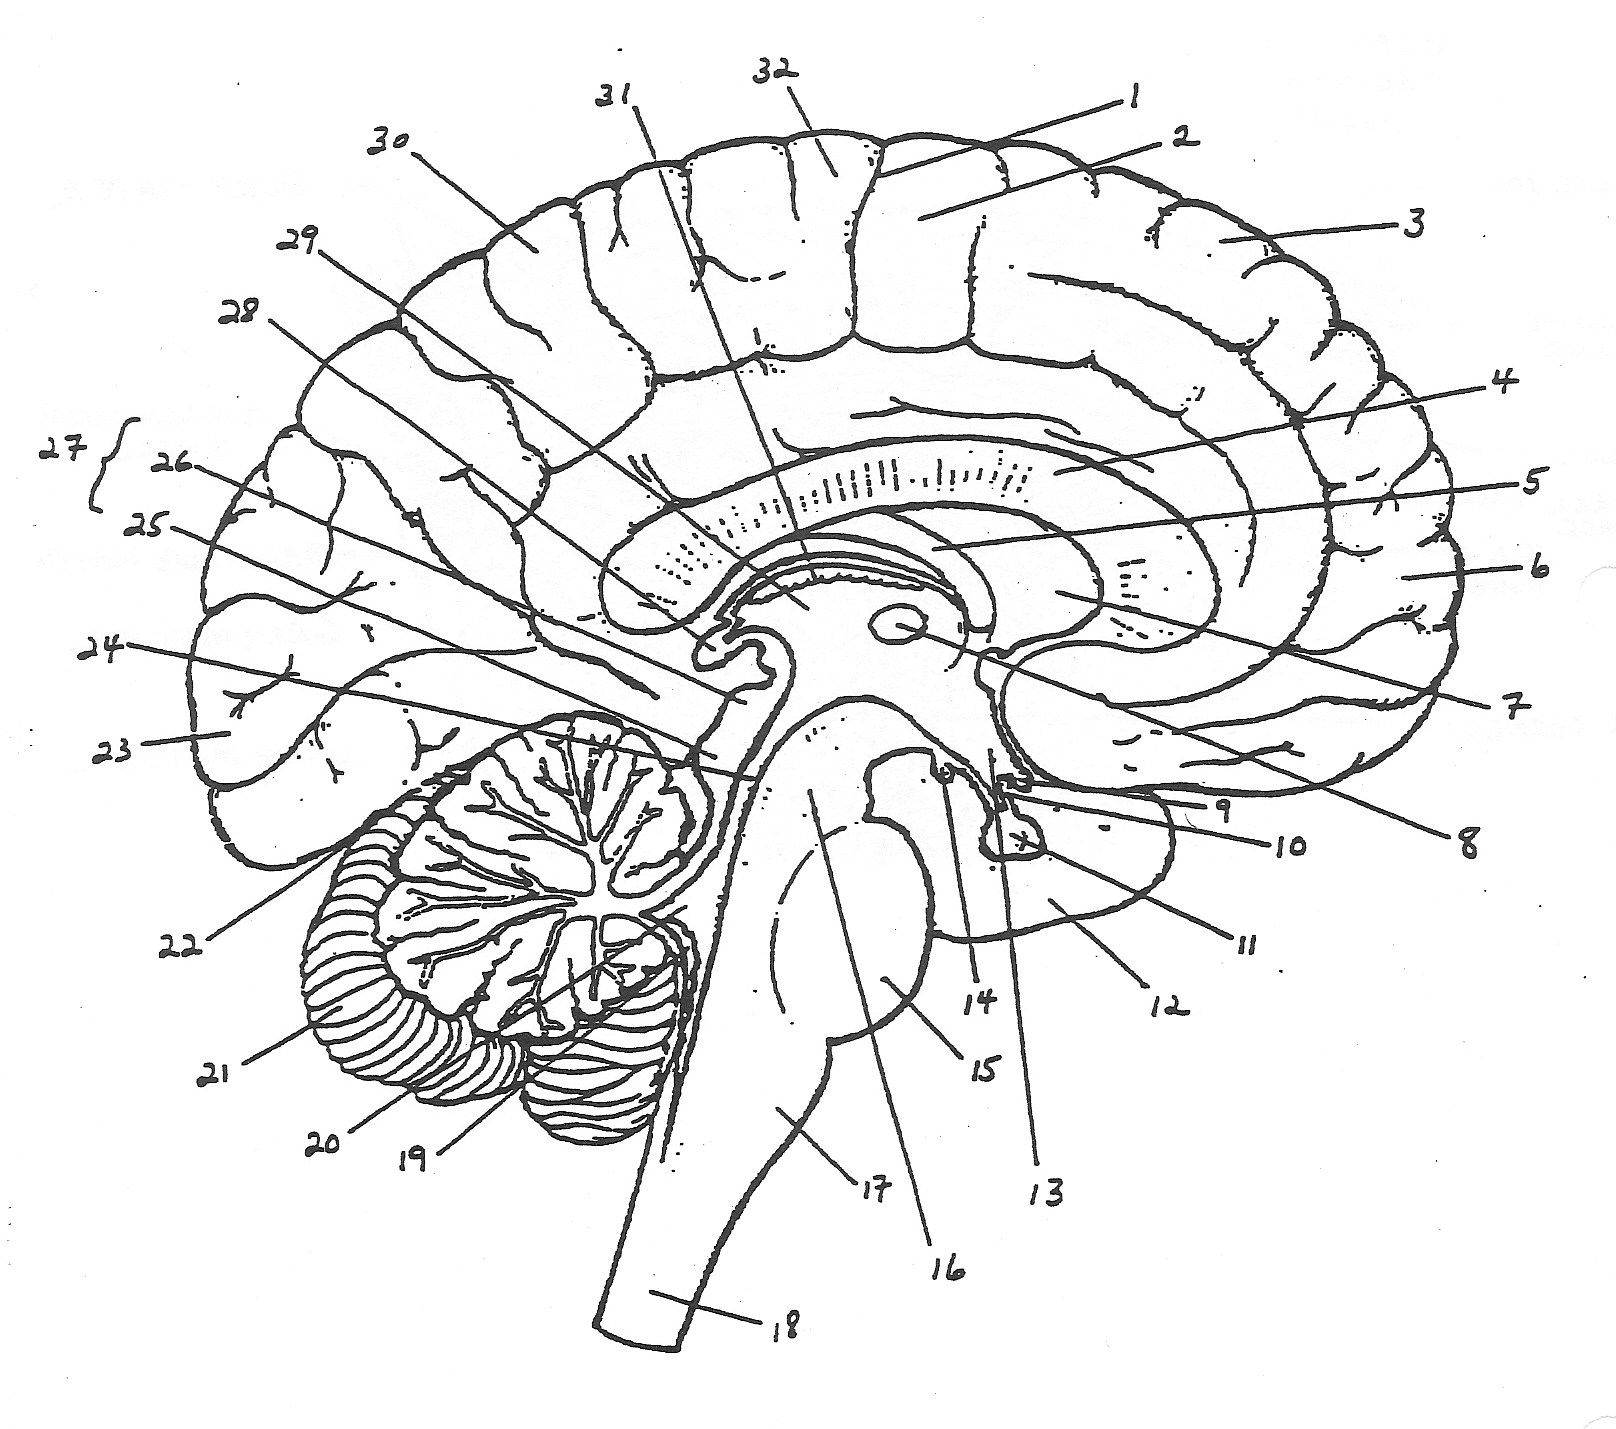 Blank Brain Diagram | human body anatomy